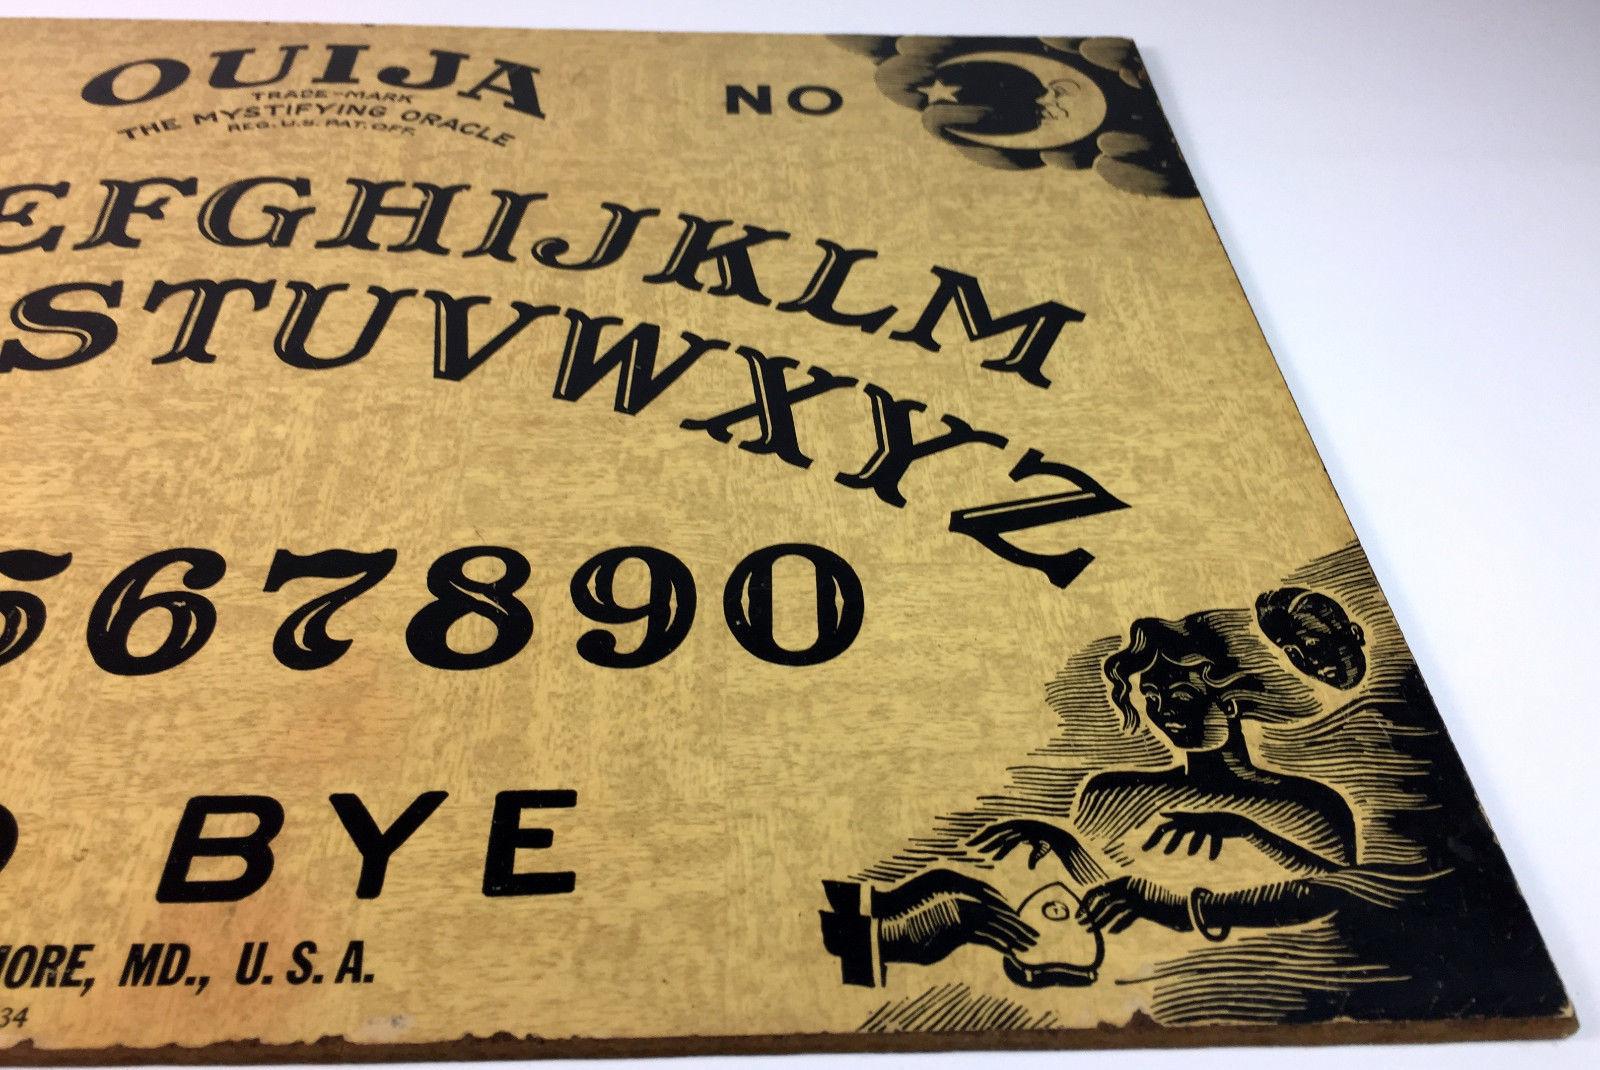 Vintage Ouija Board Game William Fuld w/Wood Planchette in BOX c1938-1945